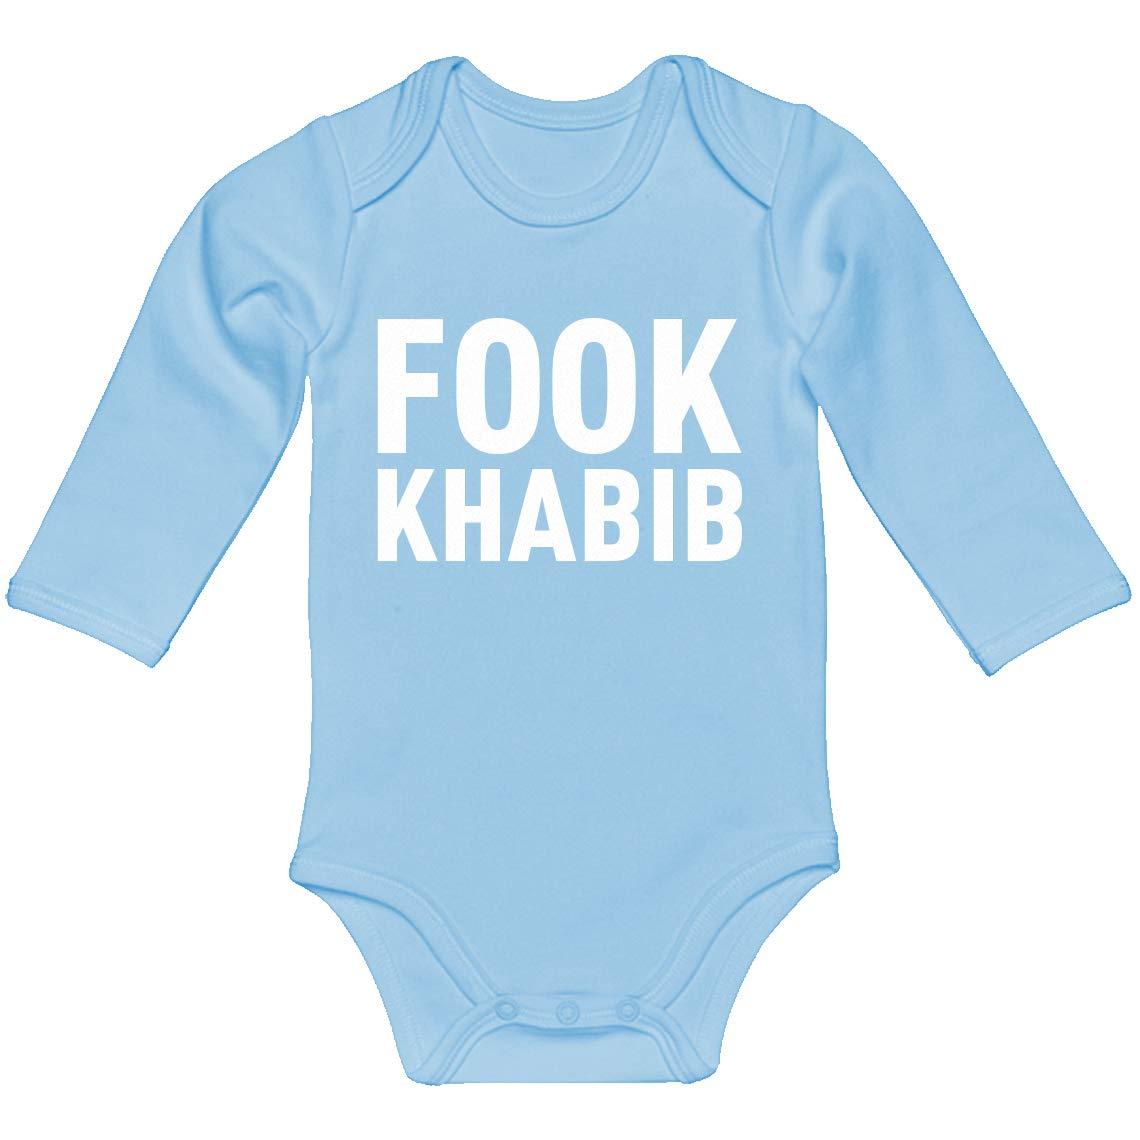 Indica Plateau Baby Onesie Fook Khabib 100/% Cotton Long Sleeve Infant Bodysuit